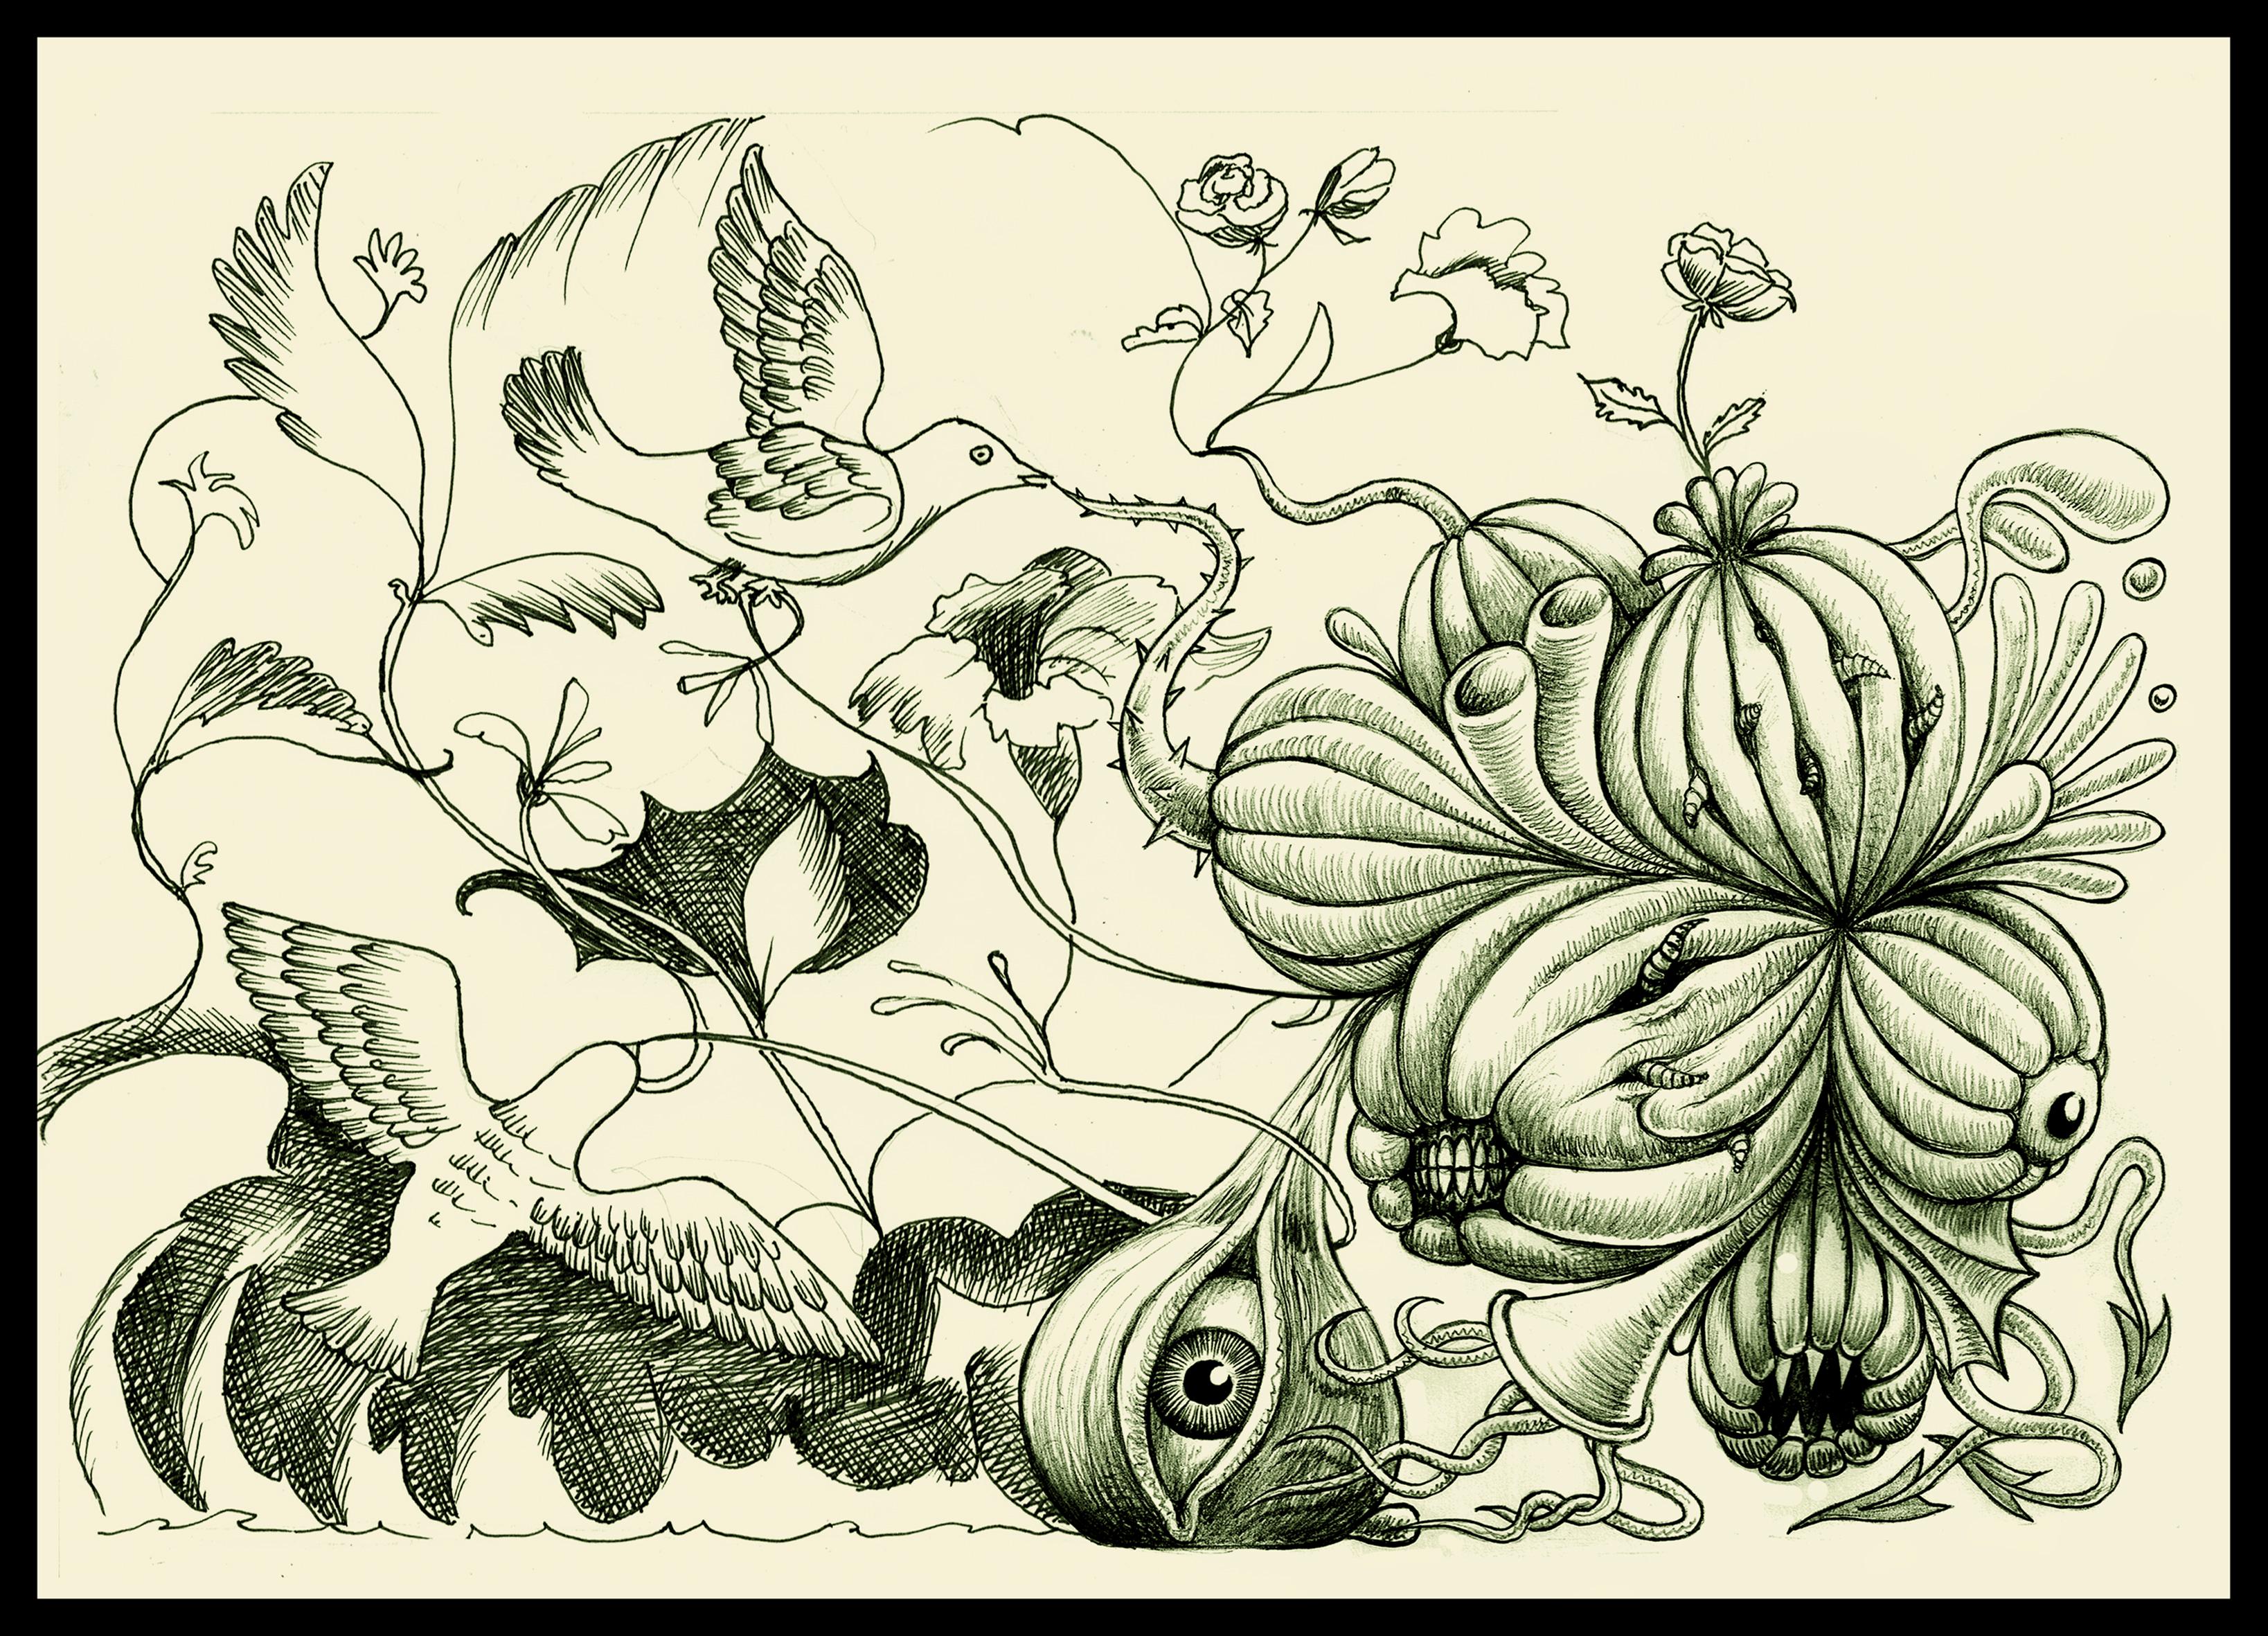 Fruit for the birds by FroukjeVoortallen